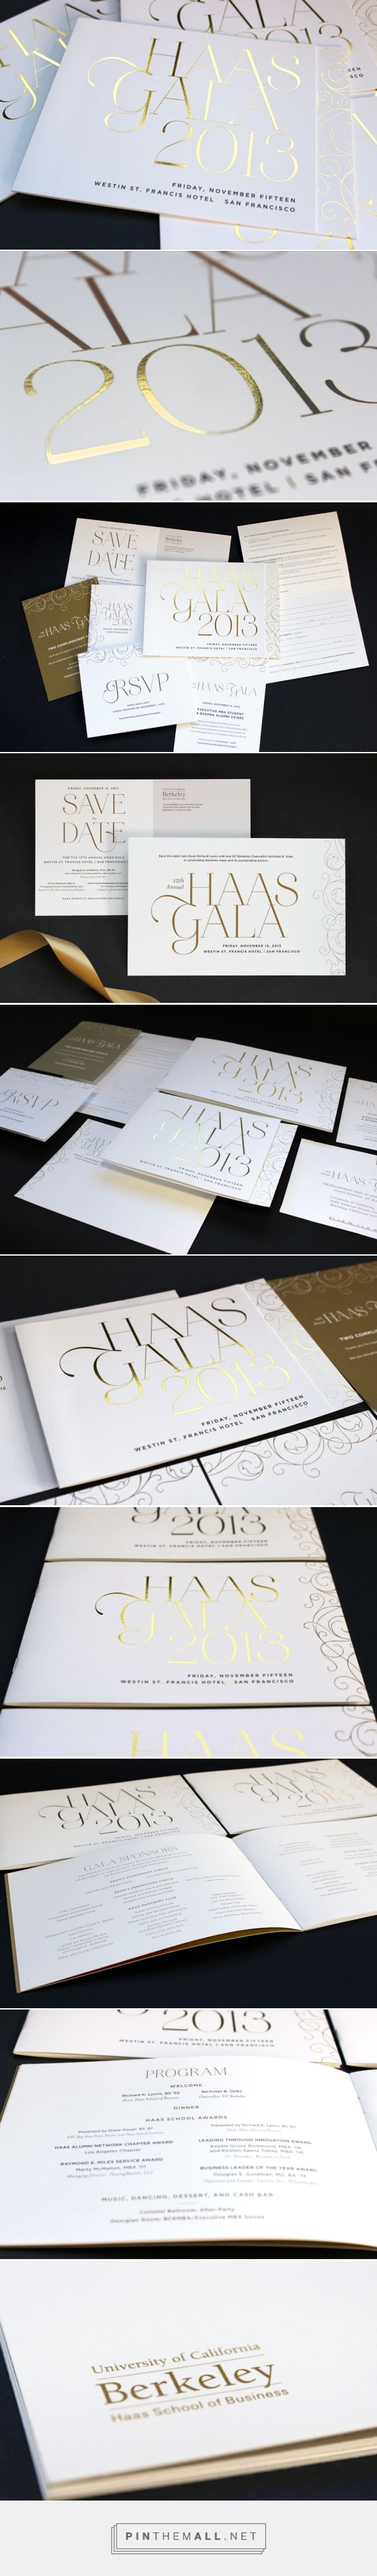 Haas Gala invitation suite. Gold foil, metallic ink, luxe cardstock. #foilstamp #invitation #gala #nonprofit || Jody Worthington